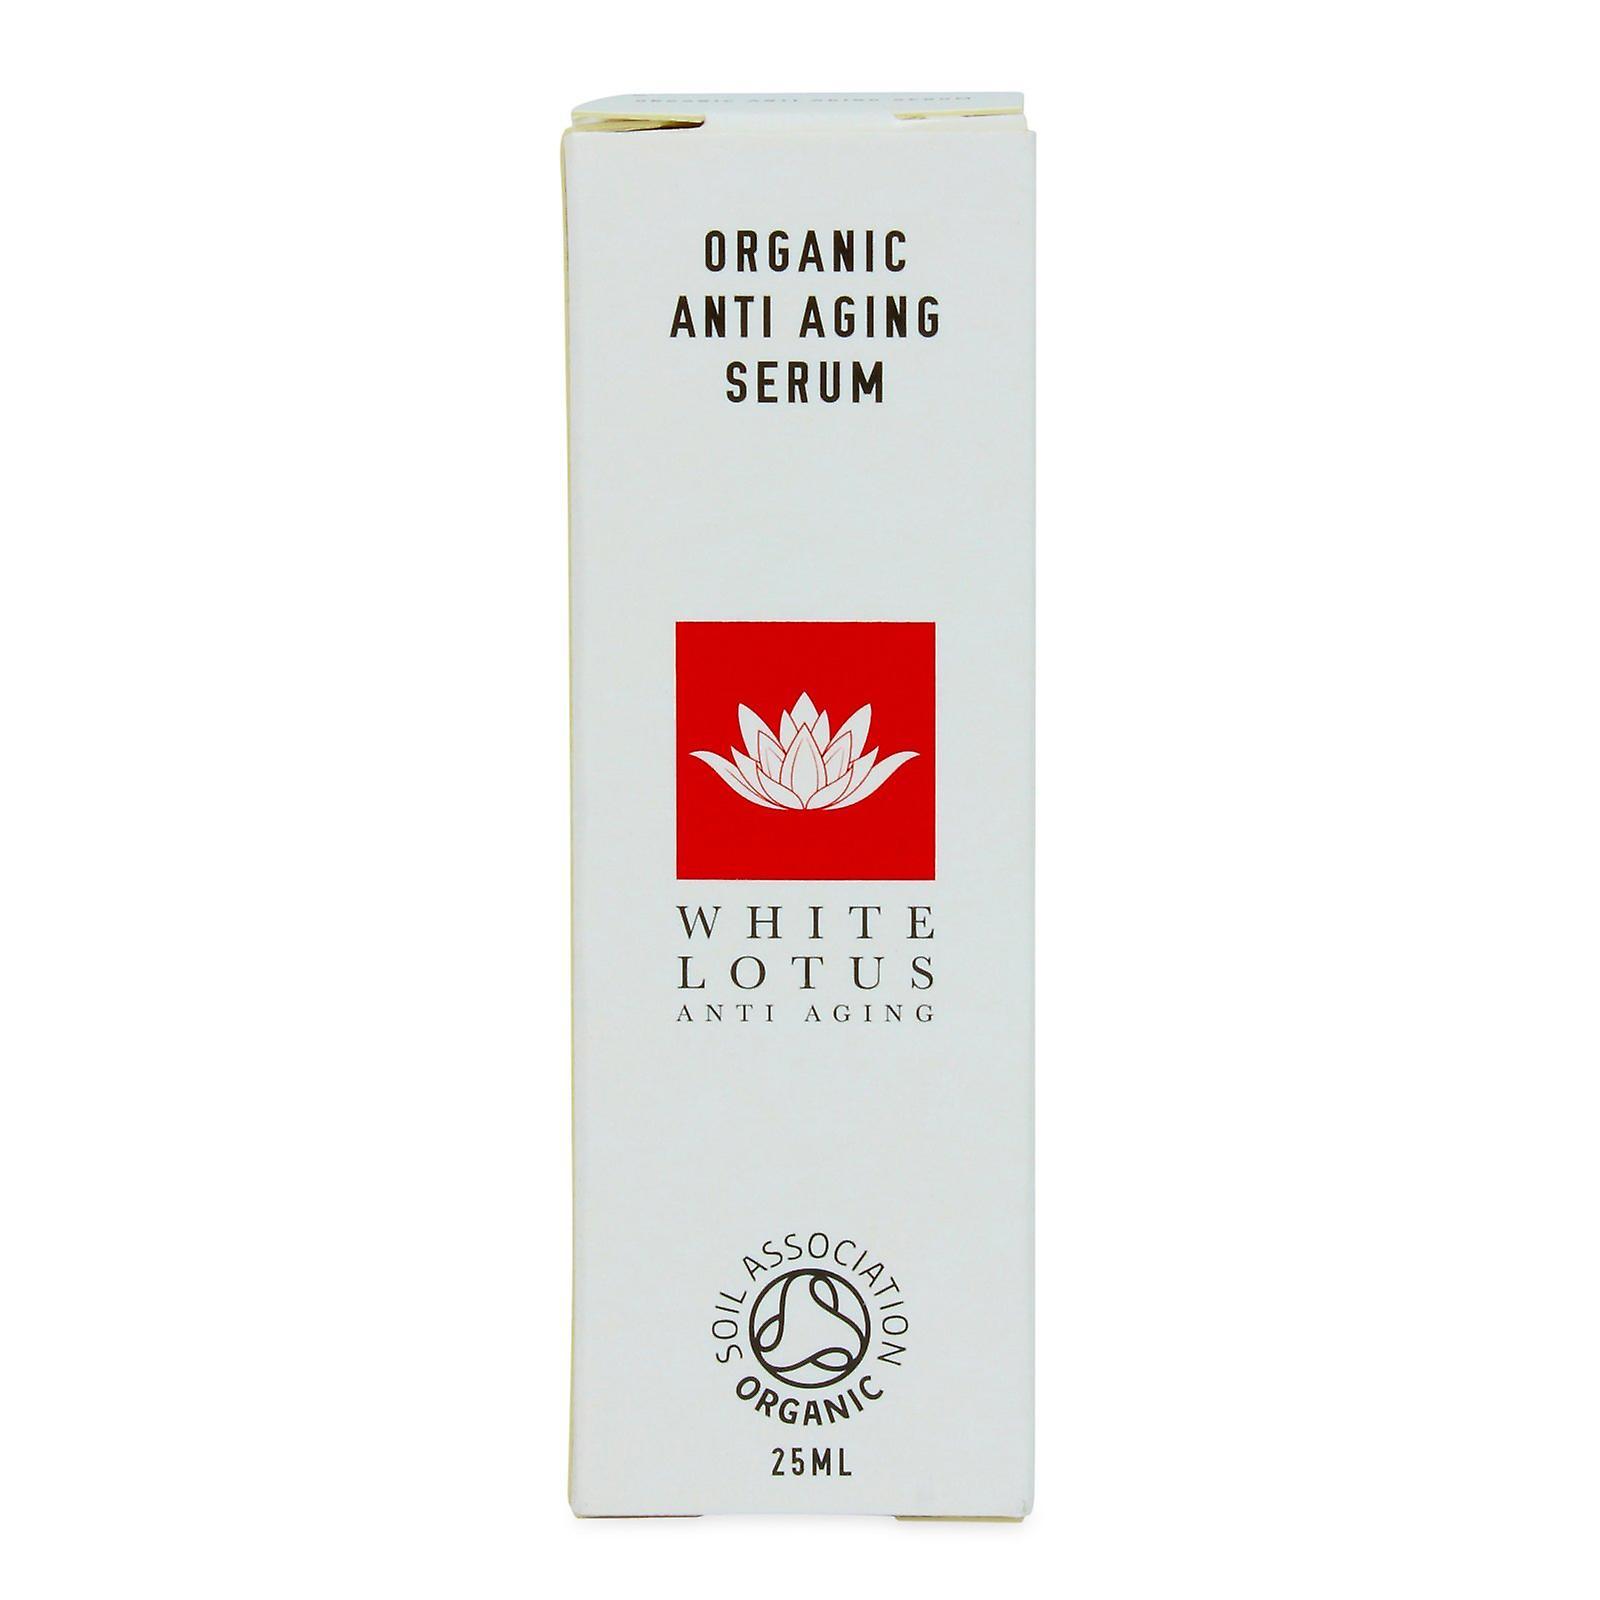 Organic anti aging serum 25ml